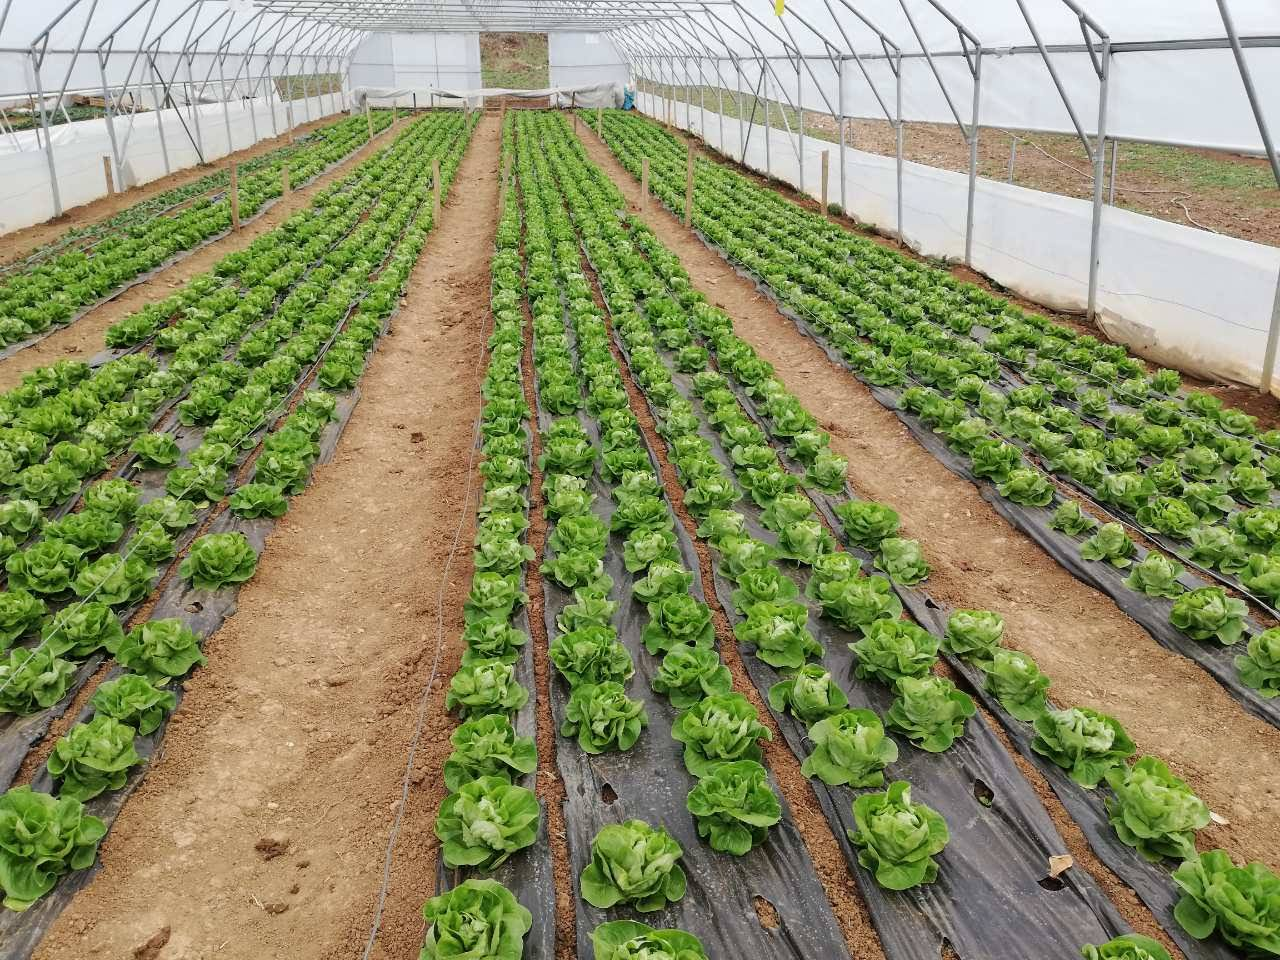 Poljoprivredno-edukativni poligon ''Mojmilo'' u svojoj ponudi nudi organske proizvode!